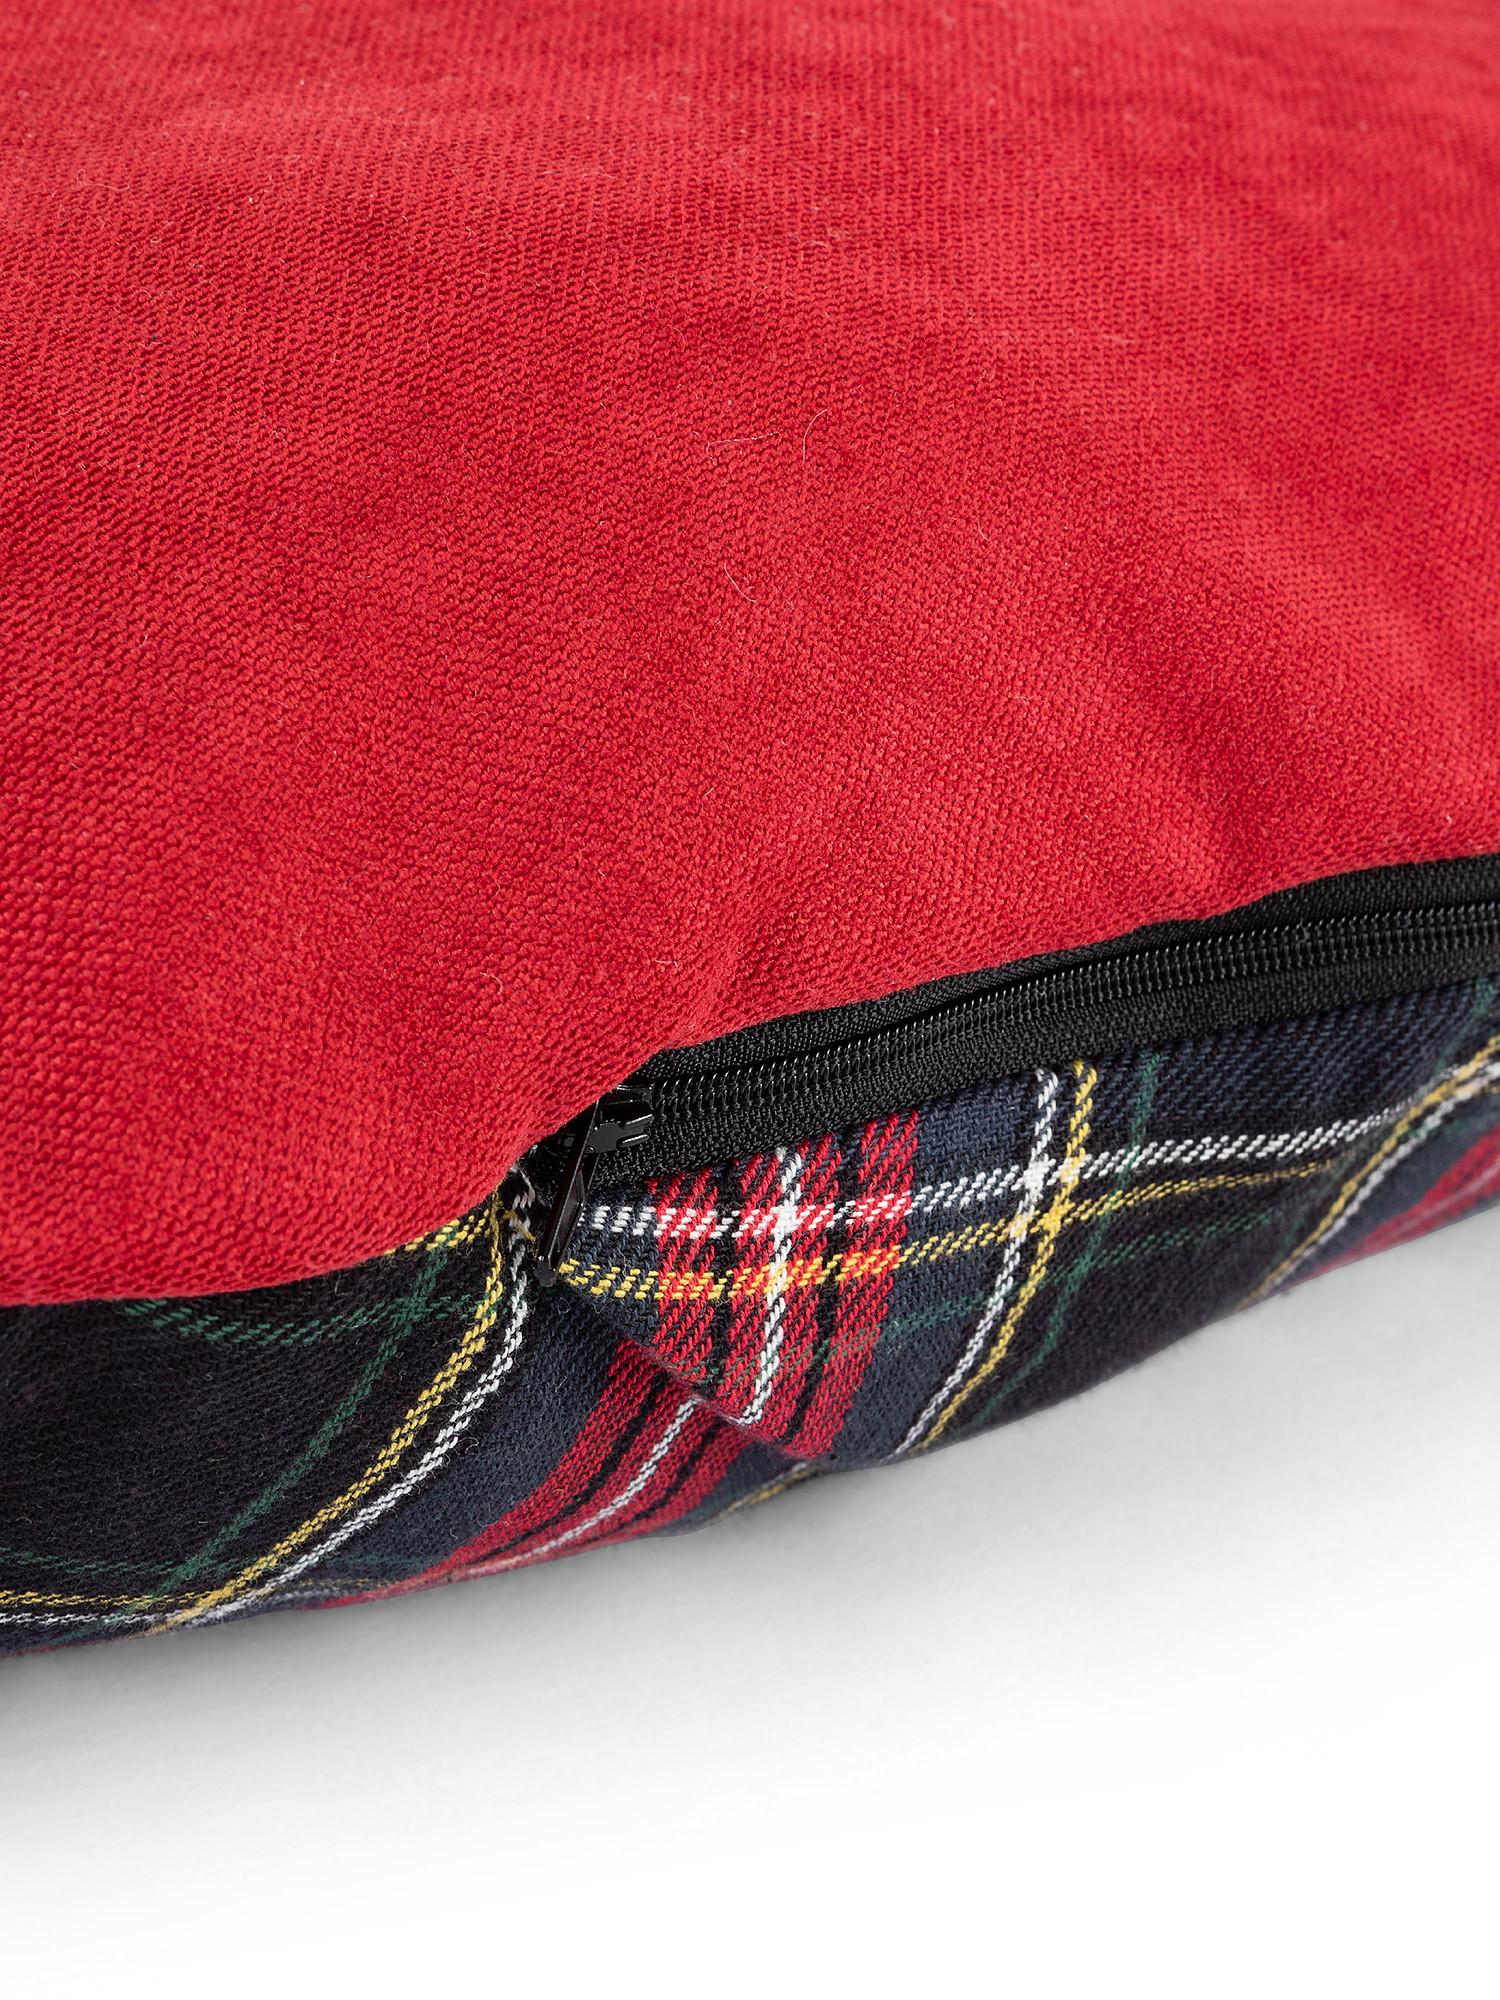 Cuccia trapuntata motivo tartan, Rosso, large image number 6